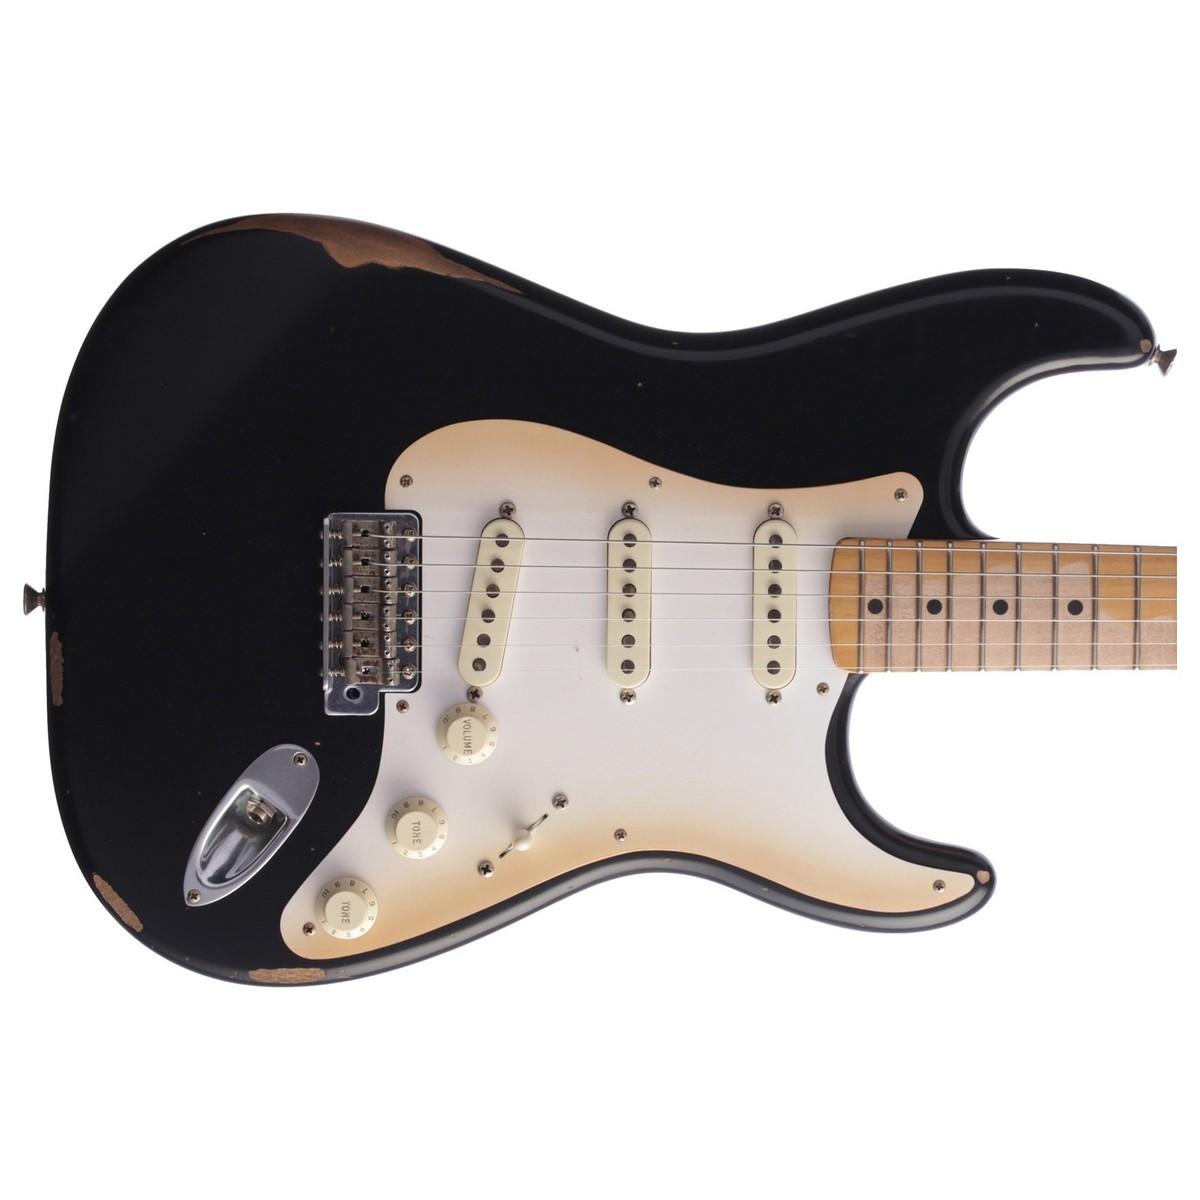 fender road worn 50s stratocaster mn black at gear4music. Black Bedroom Furniture Sets. Home Design Ideas